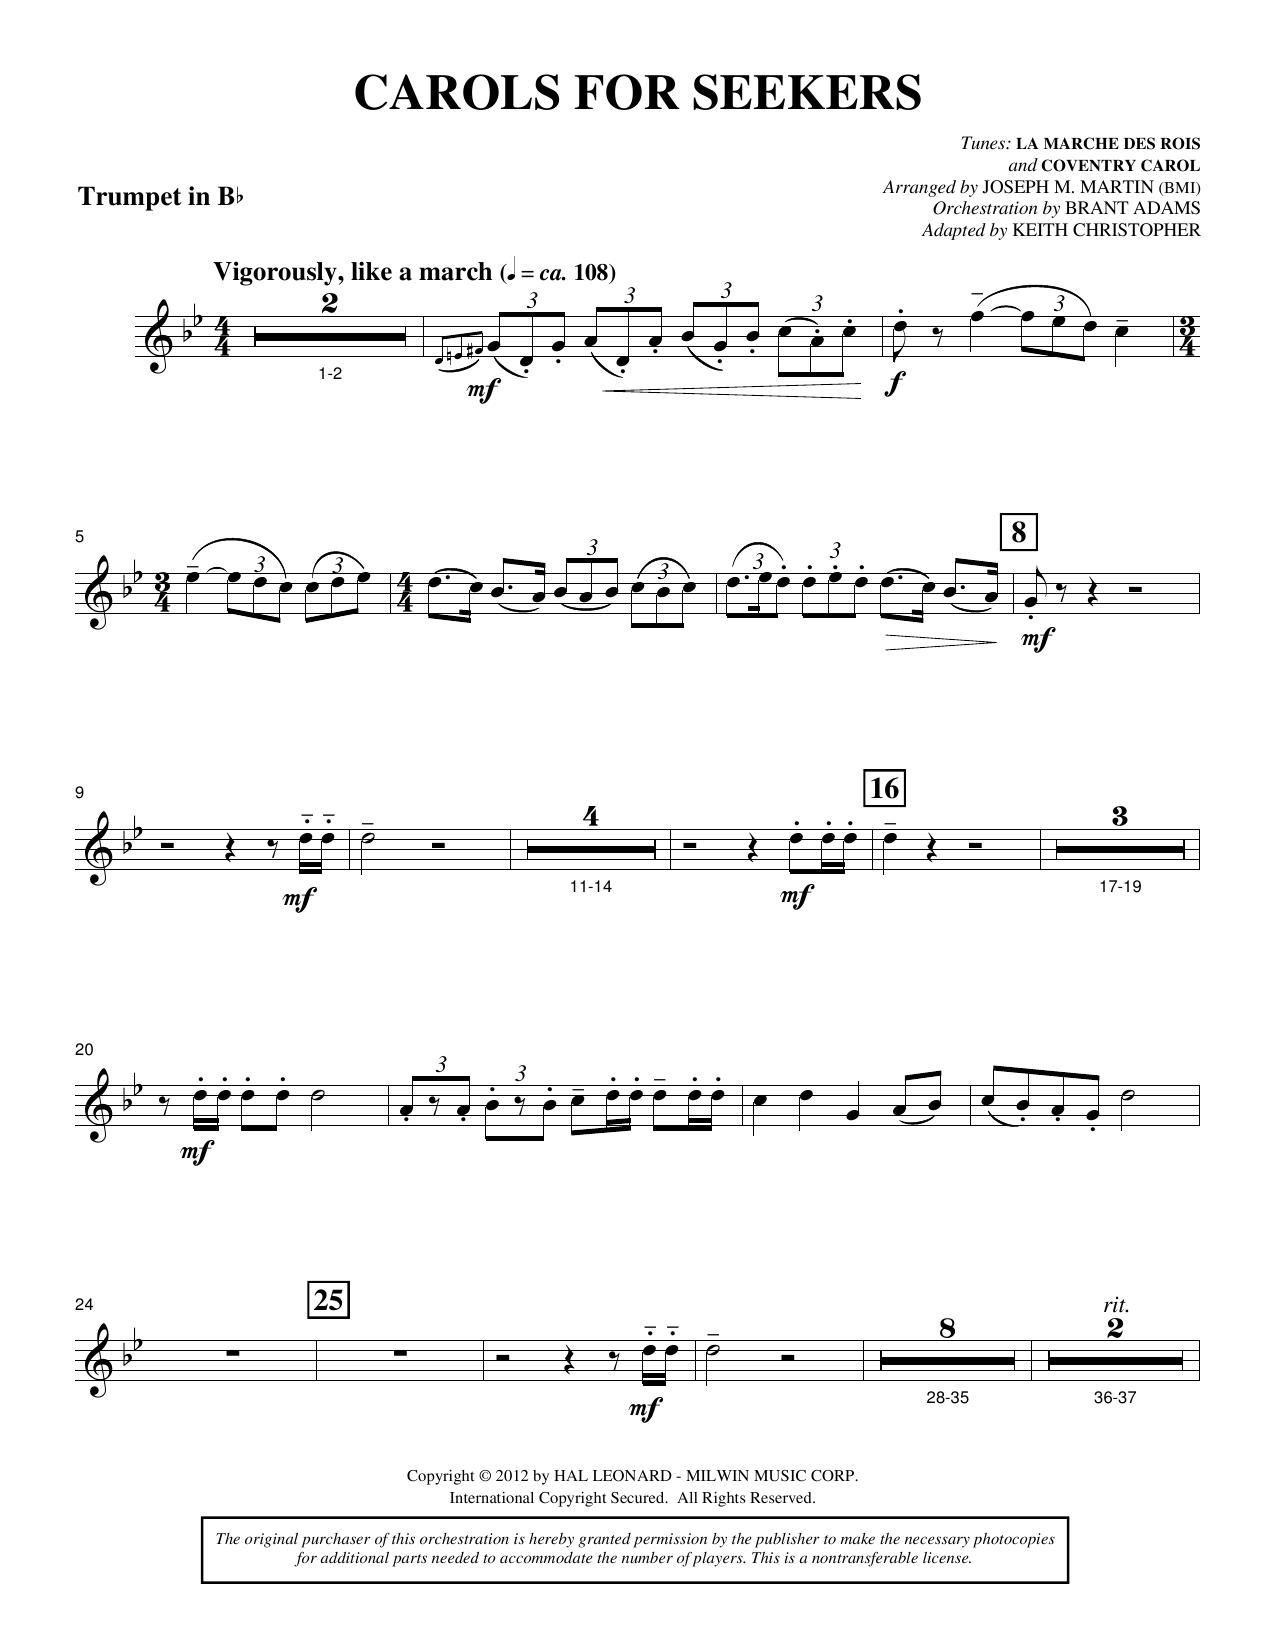 Joseph M. Martin Carols for Seekers - Bb Trumpet sheet music notes and chords. Download Printable PDF.